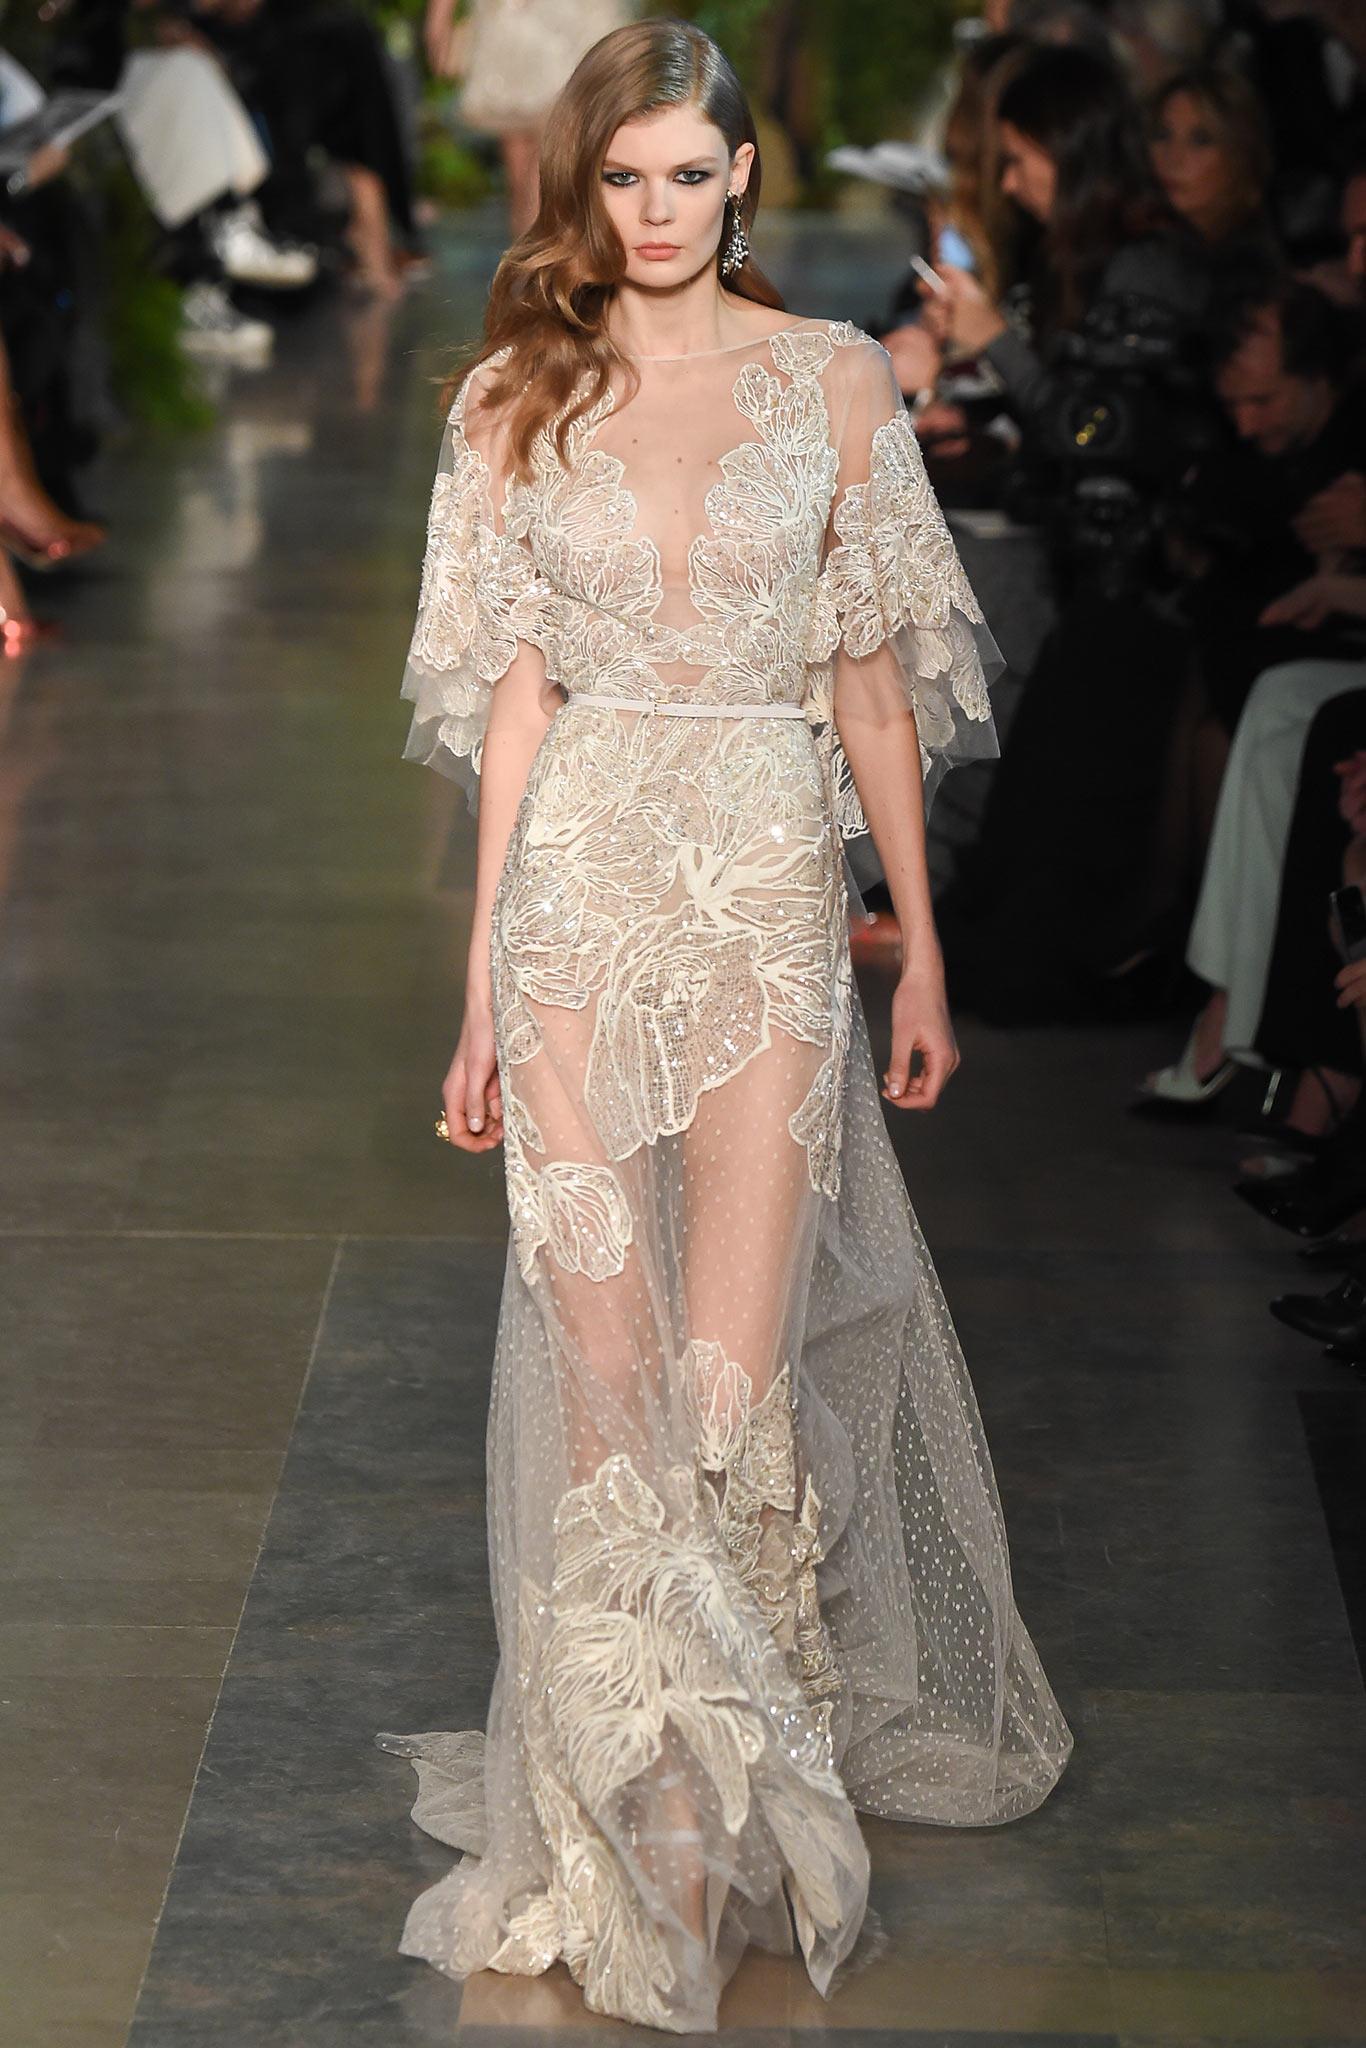 Elie Saab Spring/Summer 2015 Couture